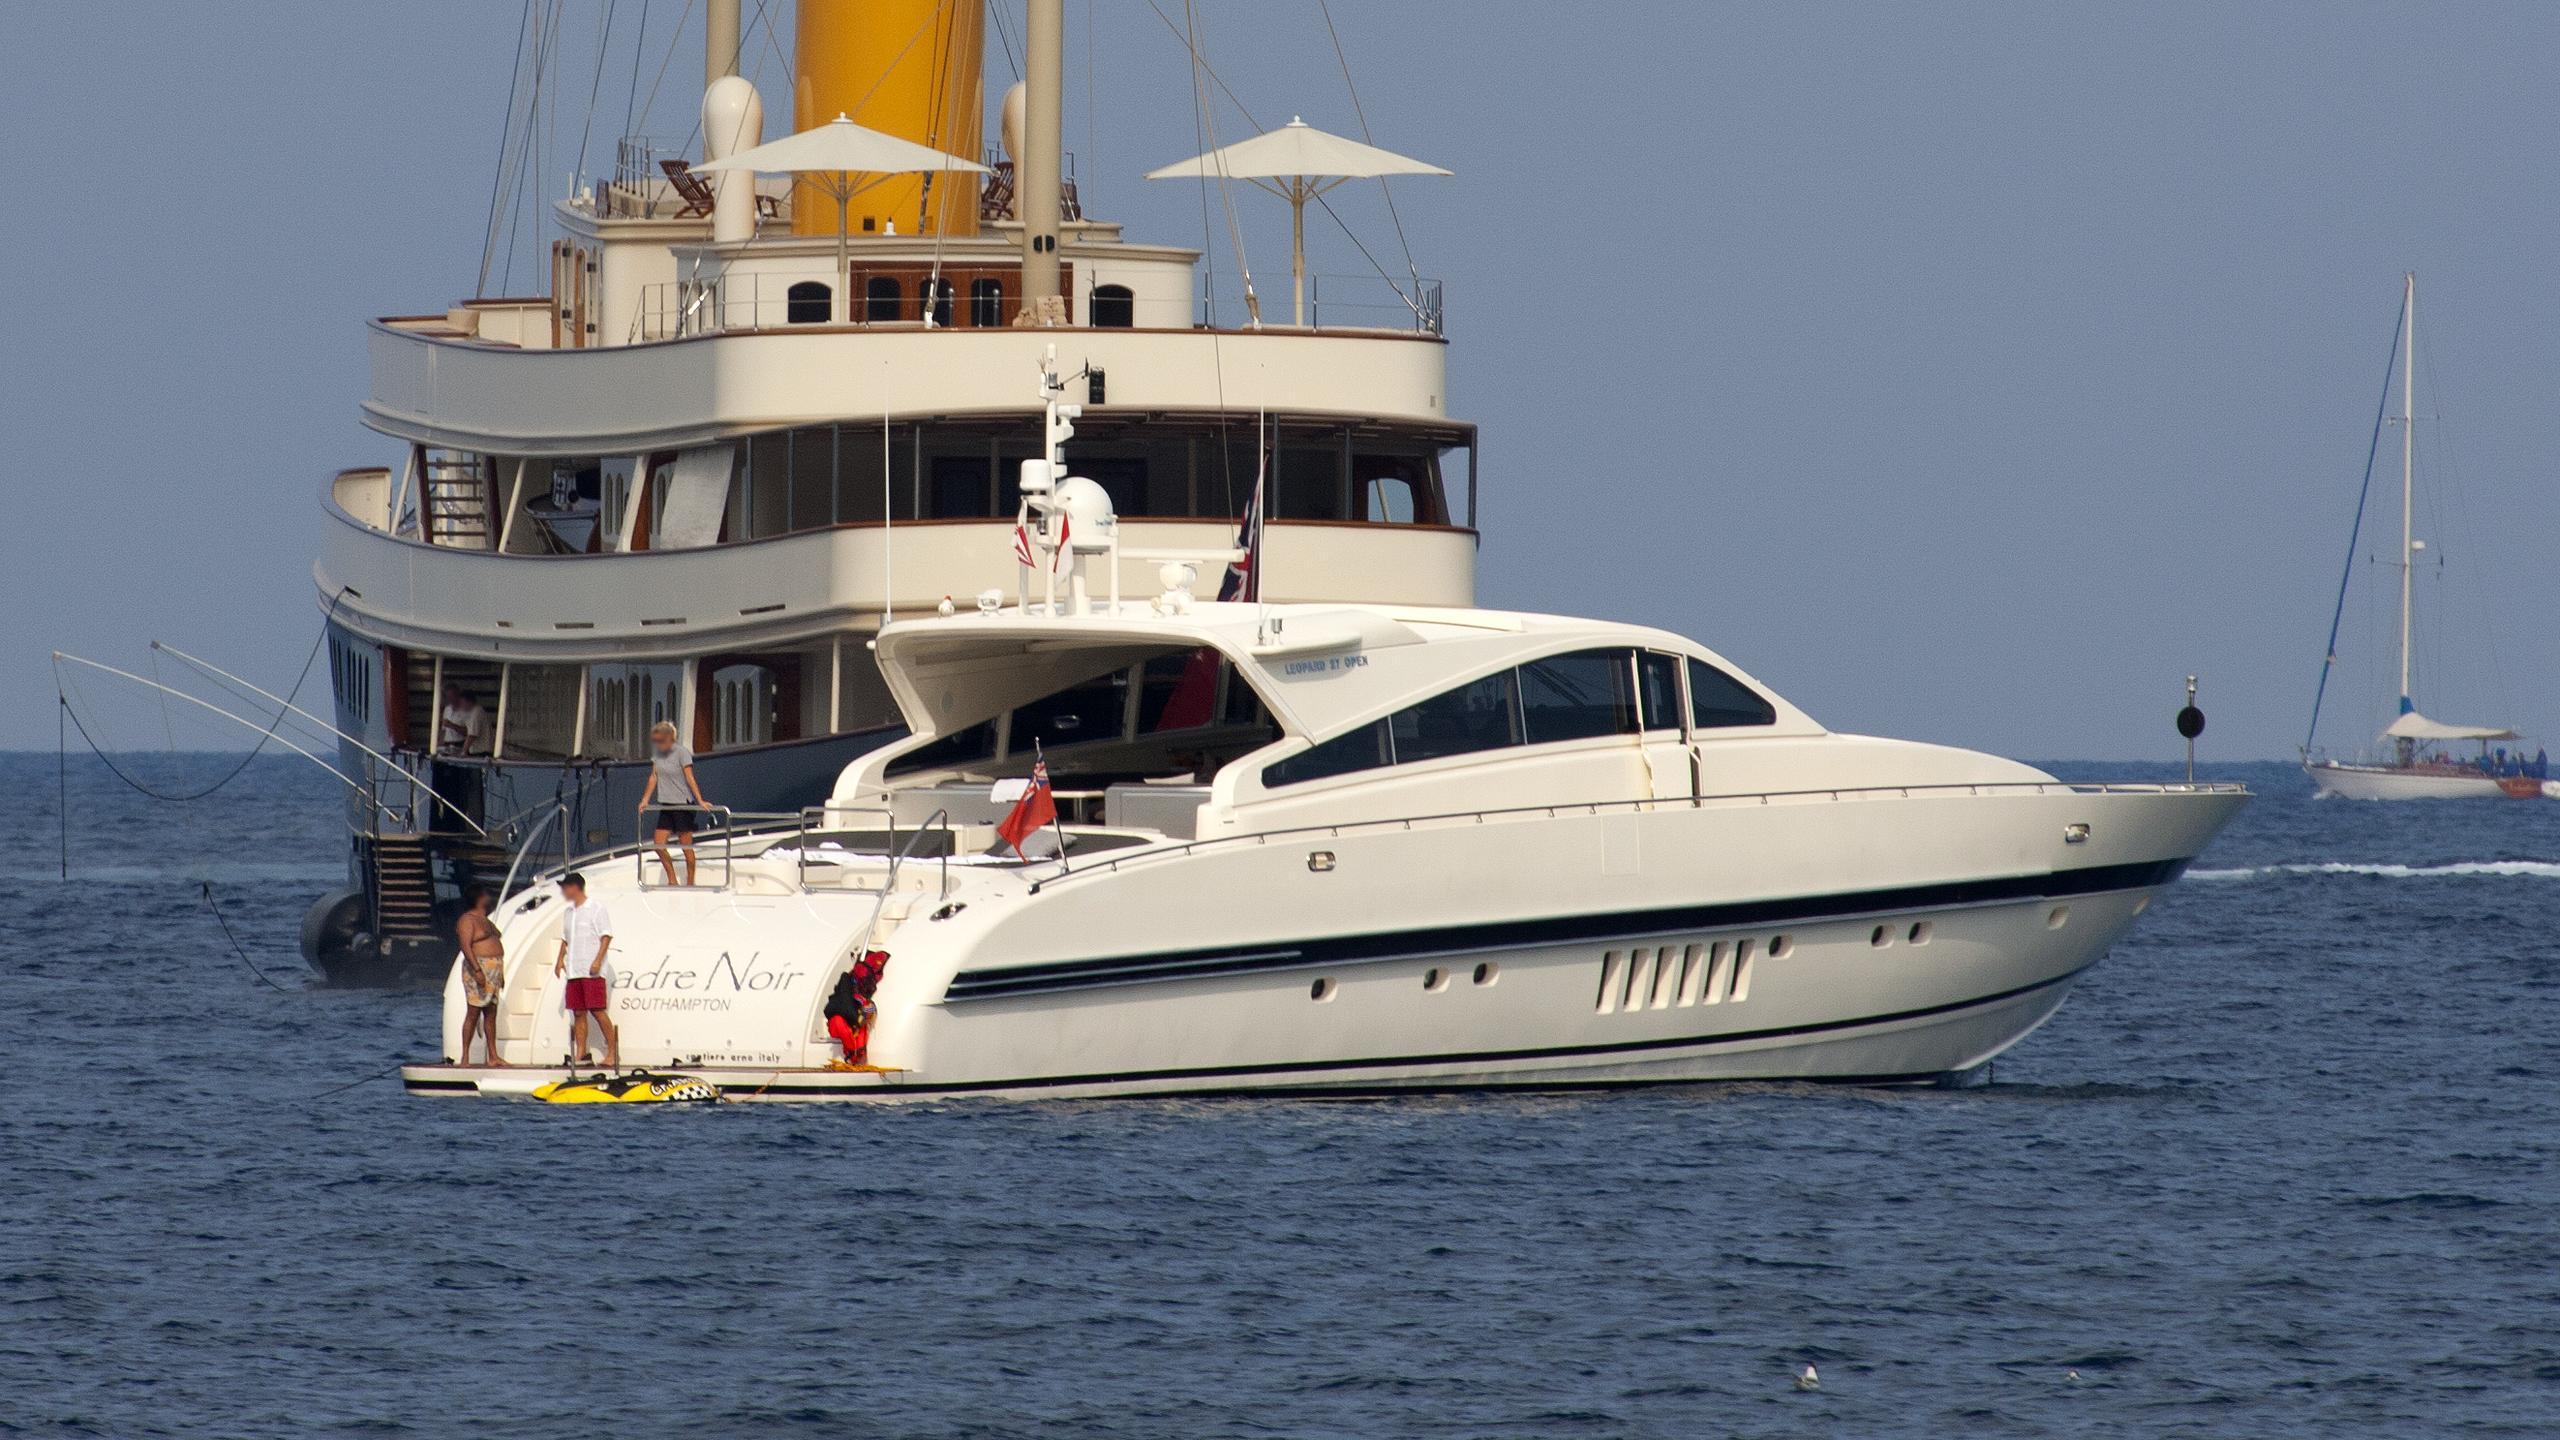 cadre-noir-motor-yacht-arno-leopard-27-sport-2001-27m-profile